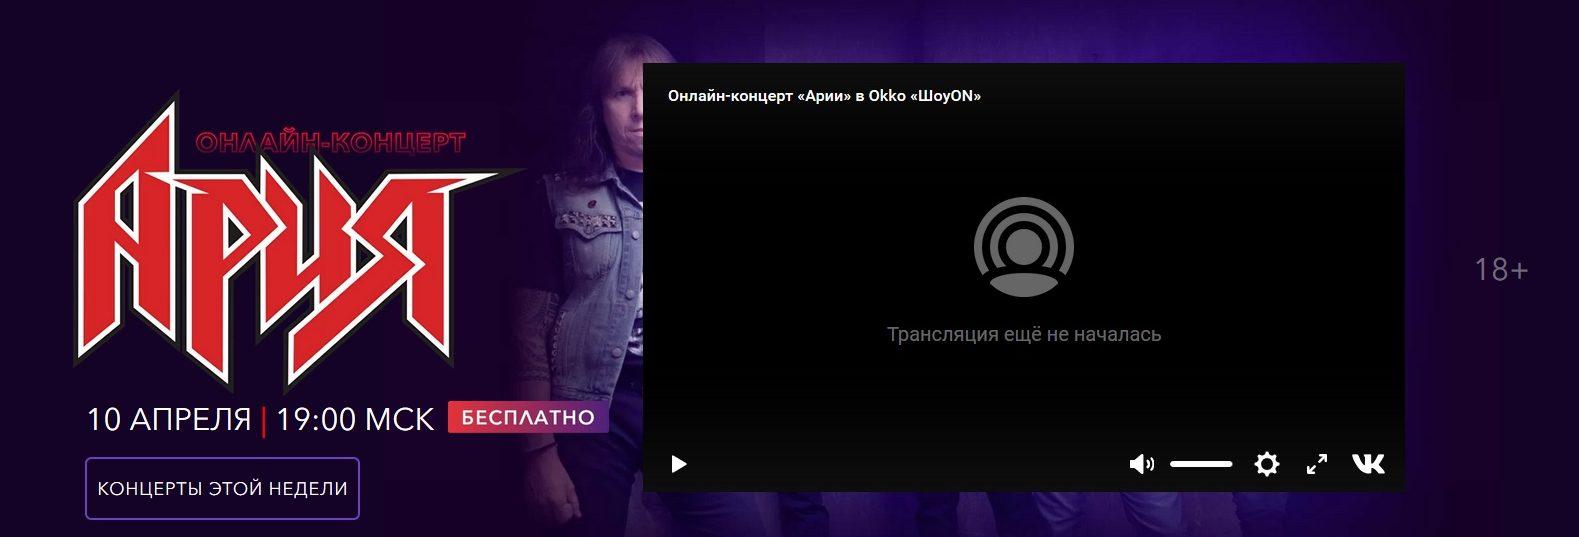 "Группа ""Ария"" даст онлайн-концерт 10 апреля"